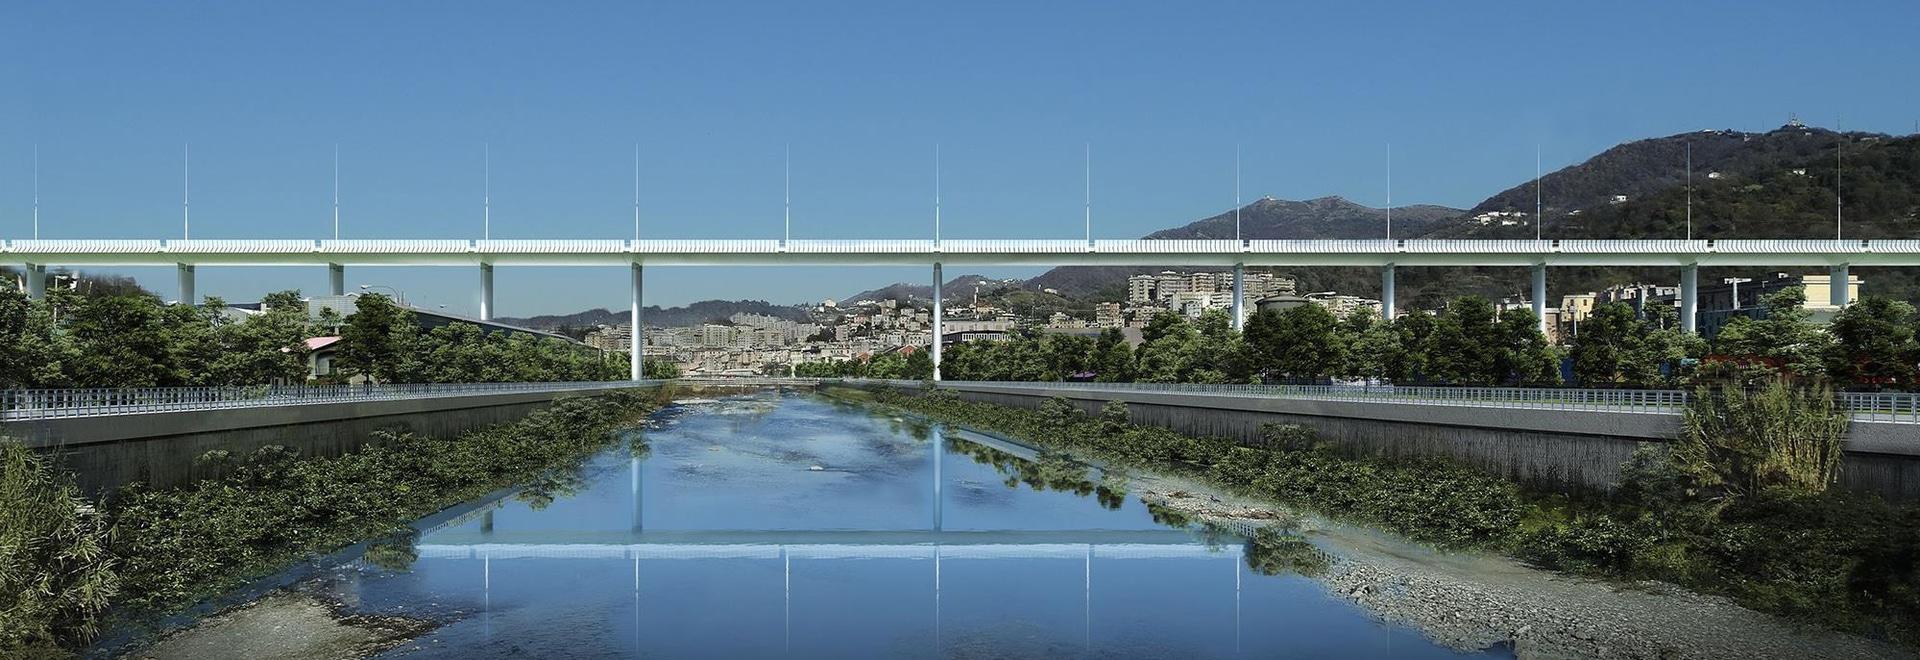 Renzo Piano unveils design for new Genoa bridge following disaster